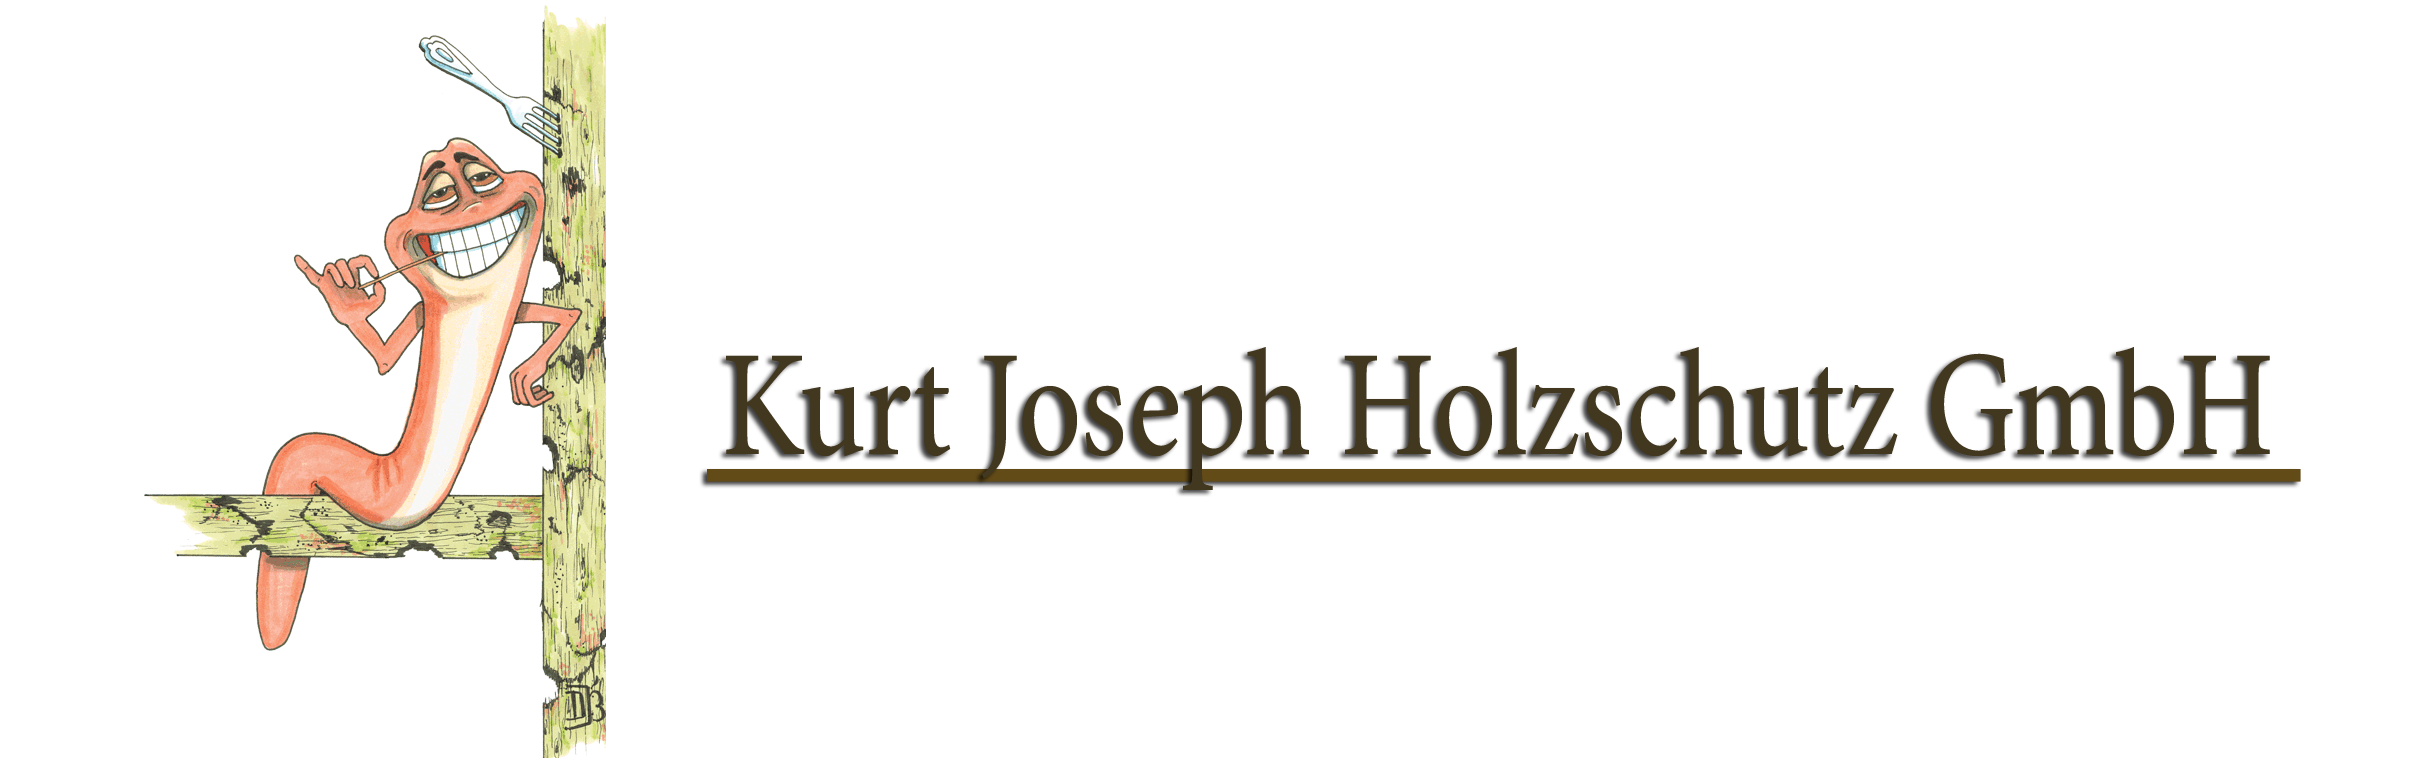 Kurt Joseph Holzschutz GmbH